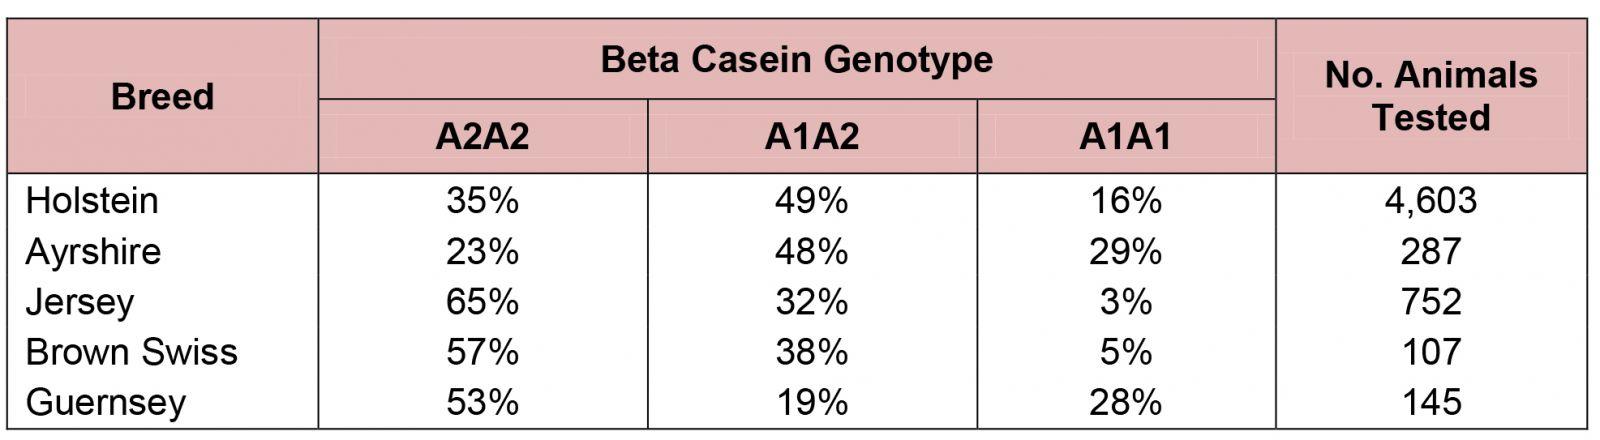 Canadian Dairy Network - Beta Casein, A2 Milk and Genetics